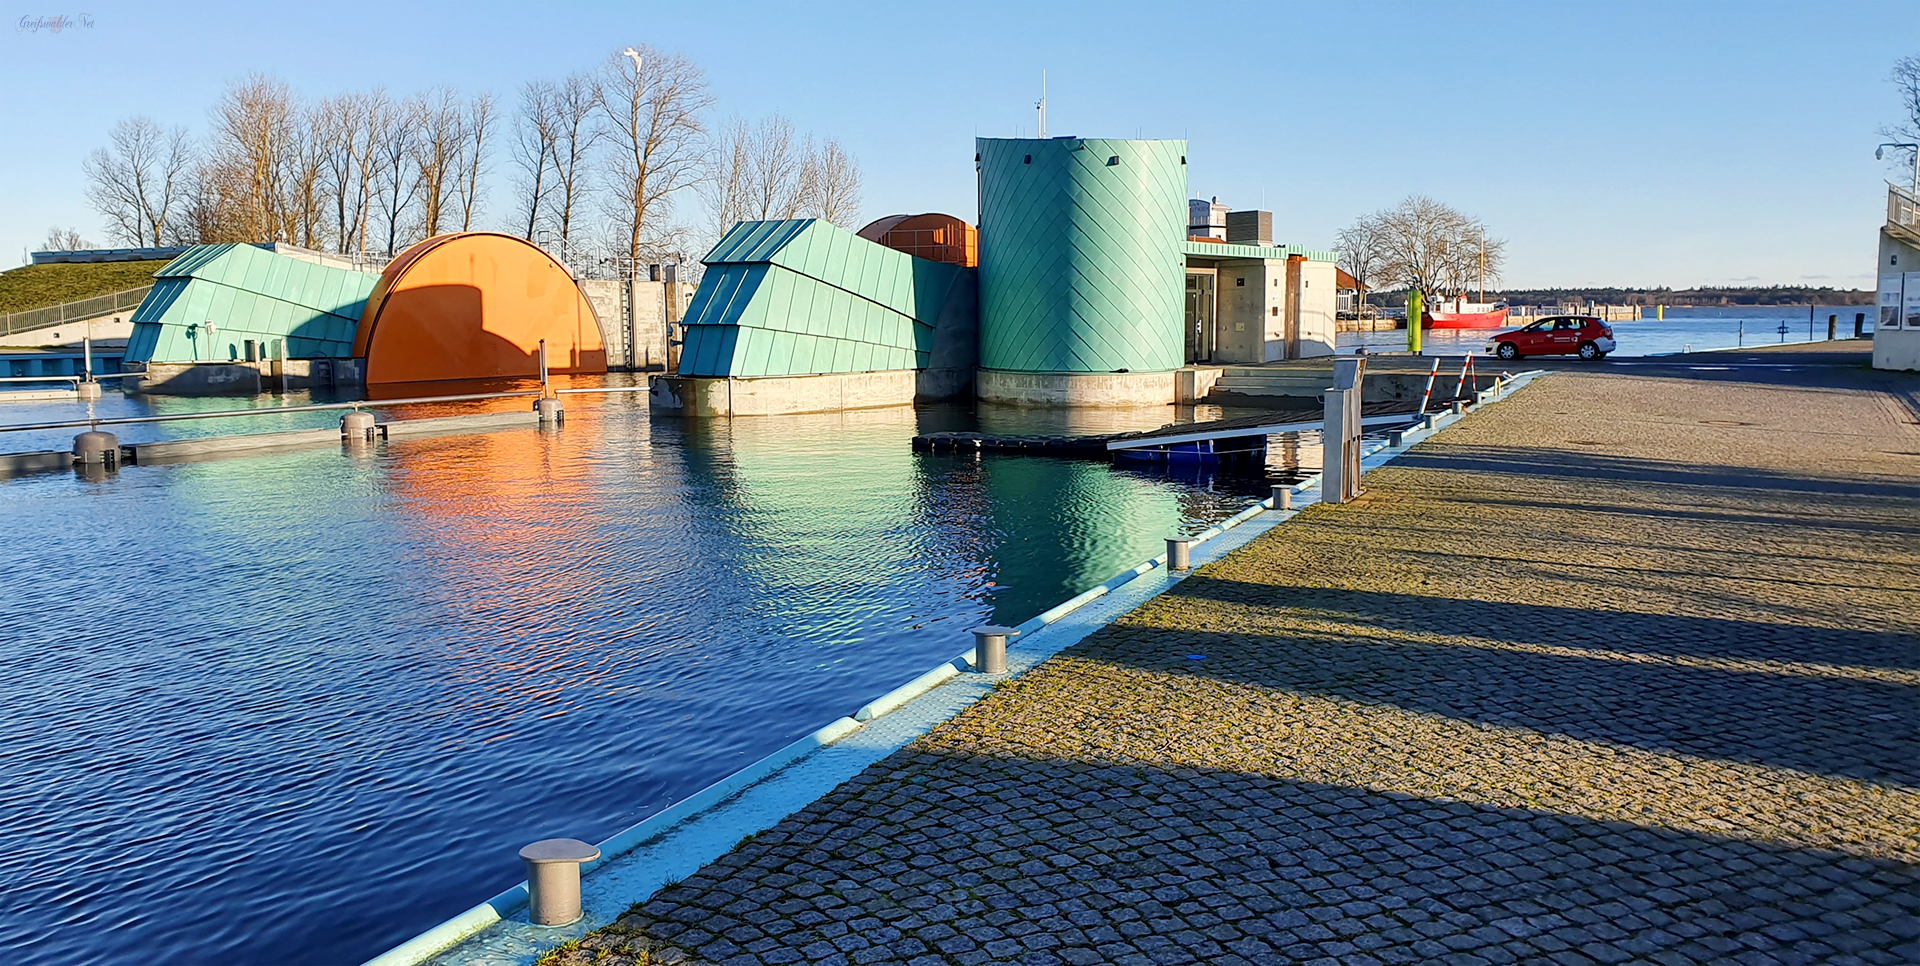 Sperrwerk in Greifswald-Wieck